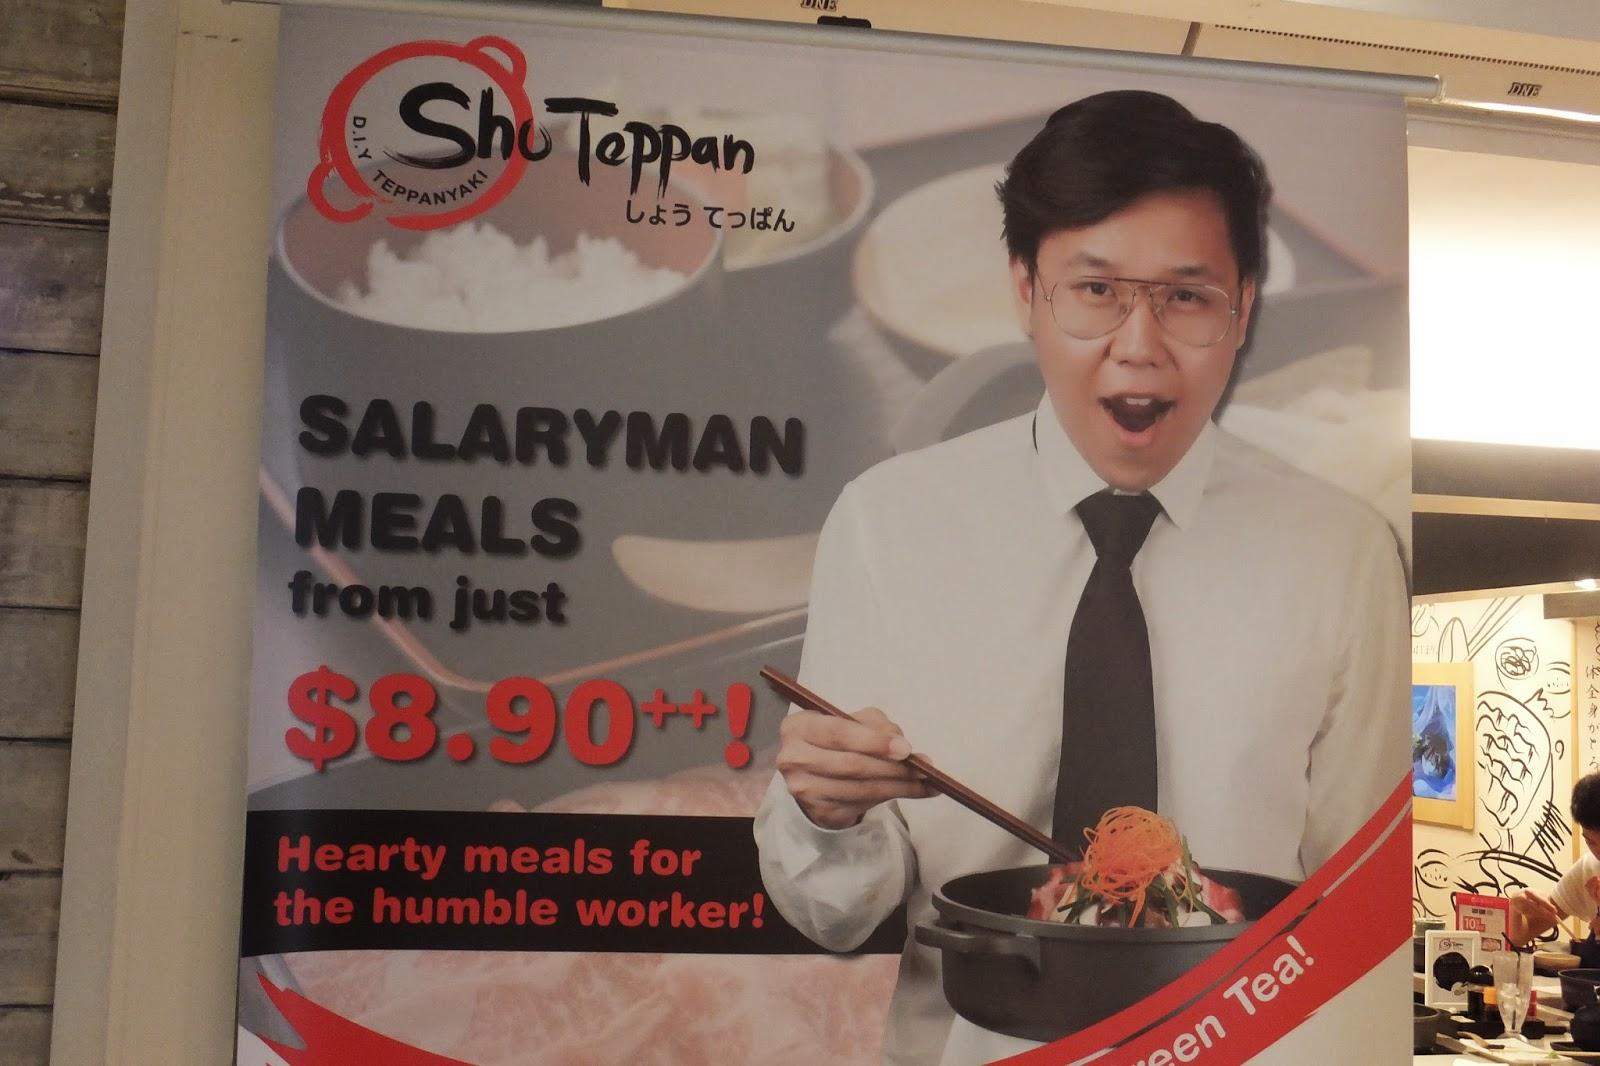 sho-teppan-salaryman-meal-singapore サラリーマン定食